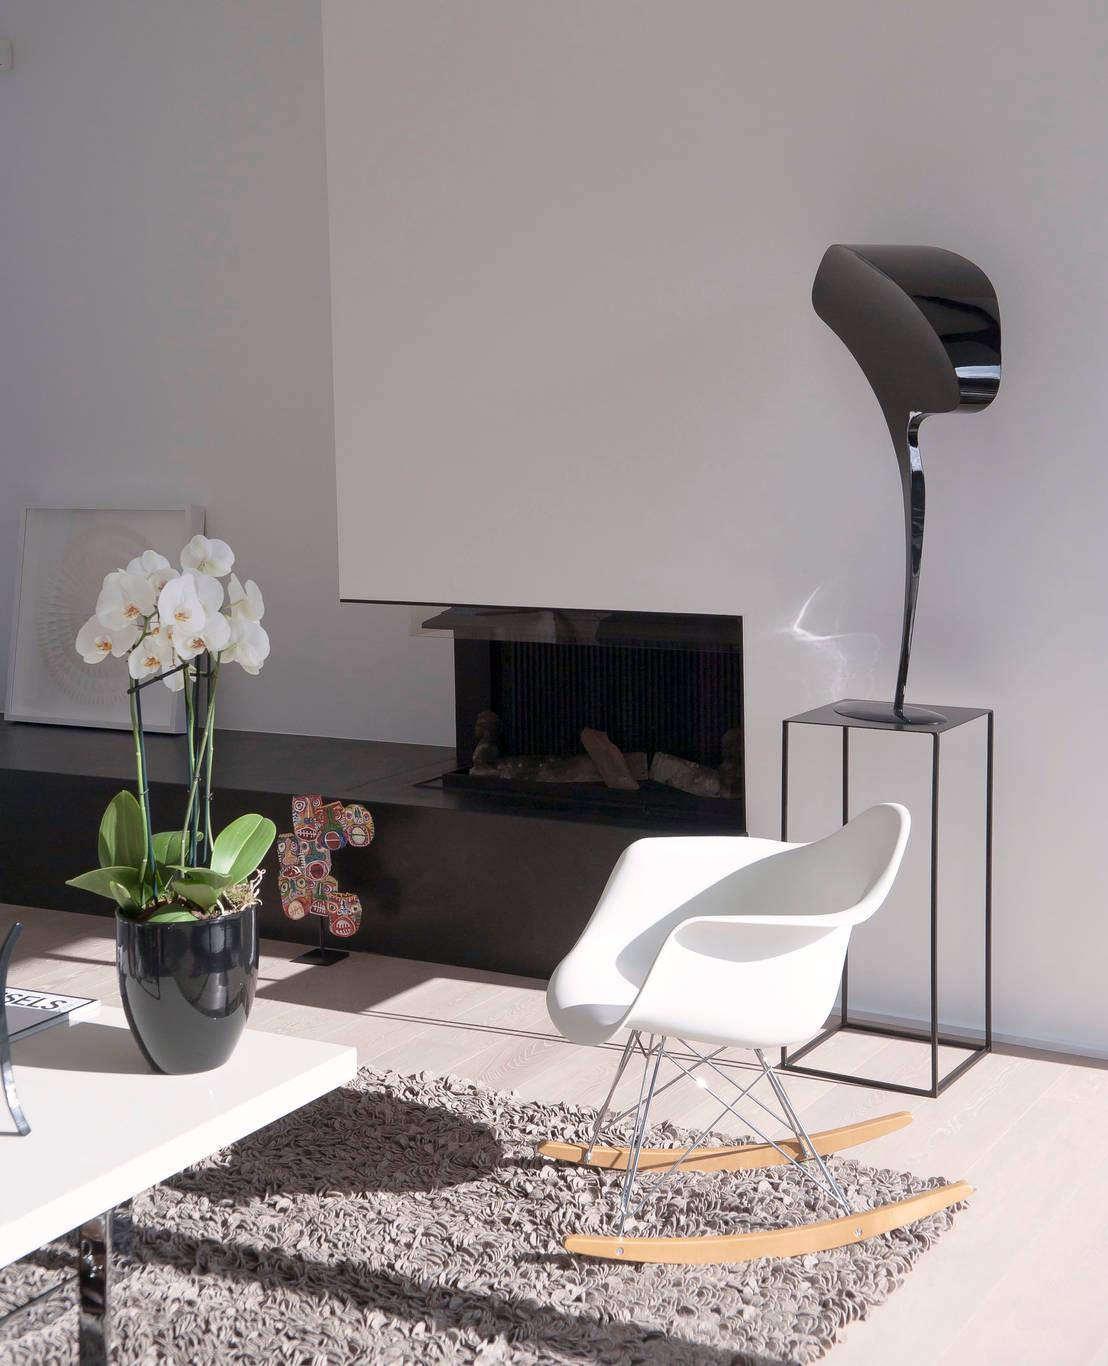 decoration noir et blanc door isabelle leclercq design homify. Black Bedroom Furniture Sets. Home Design Ideas